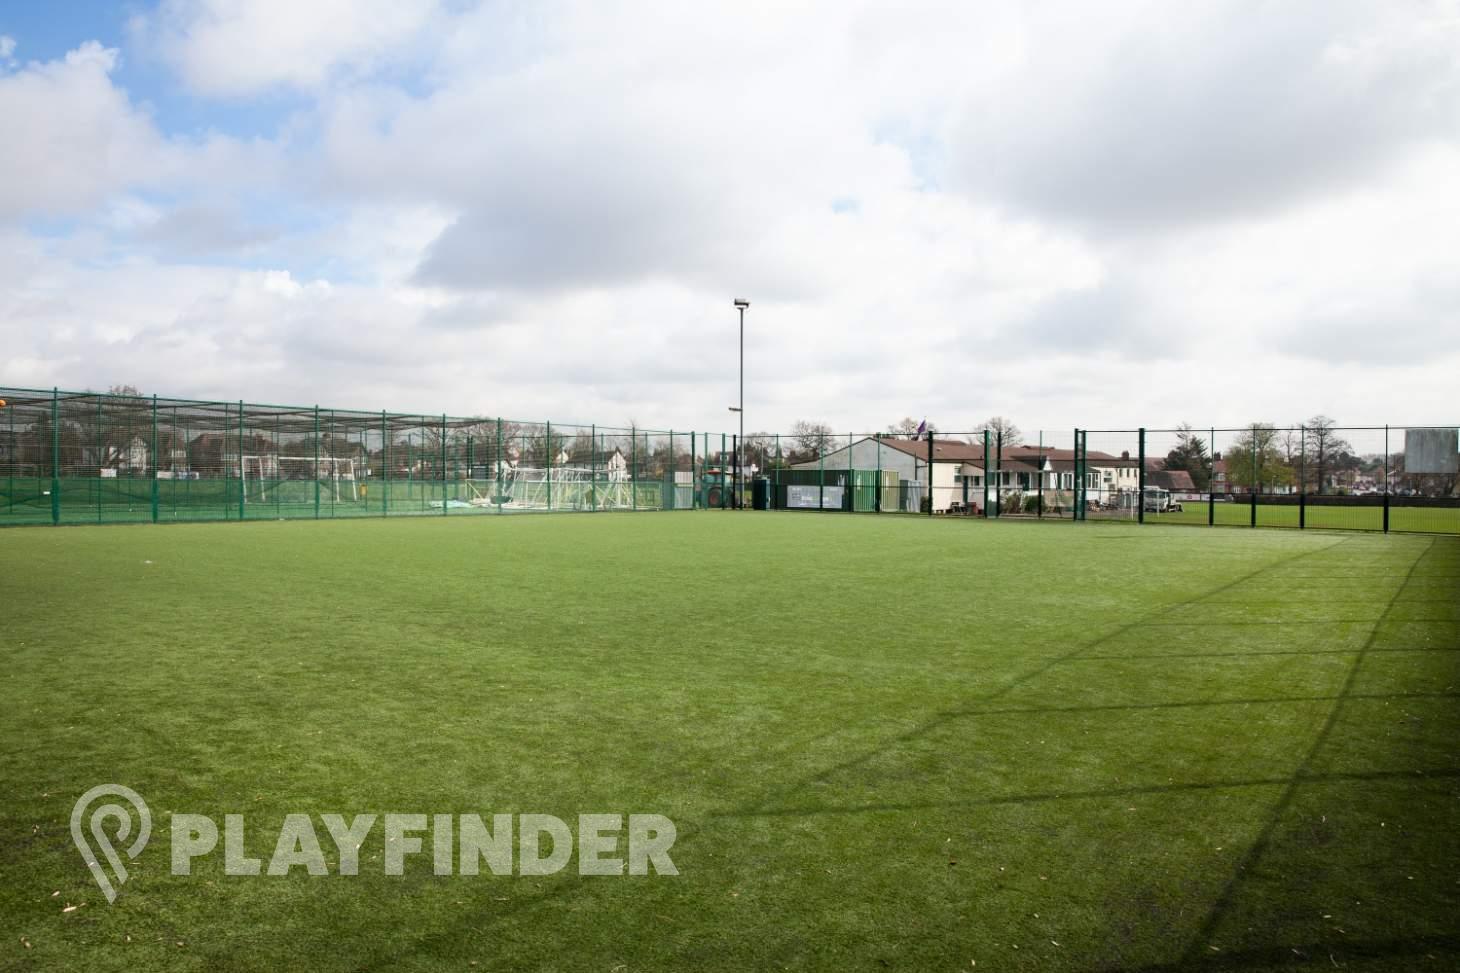 Winchmore Hill Sports Club 5 a side | 3G Astroturf football pitch